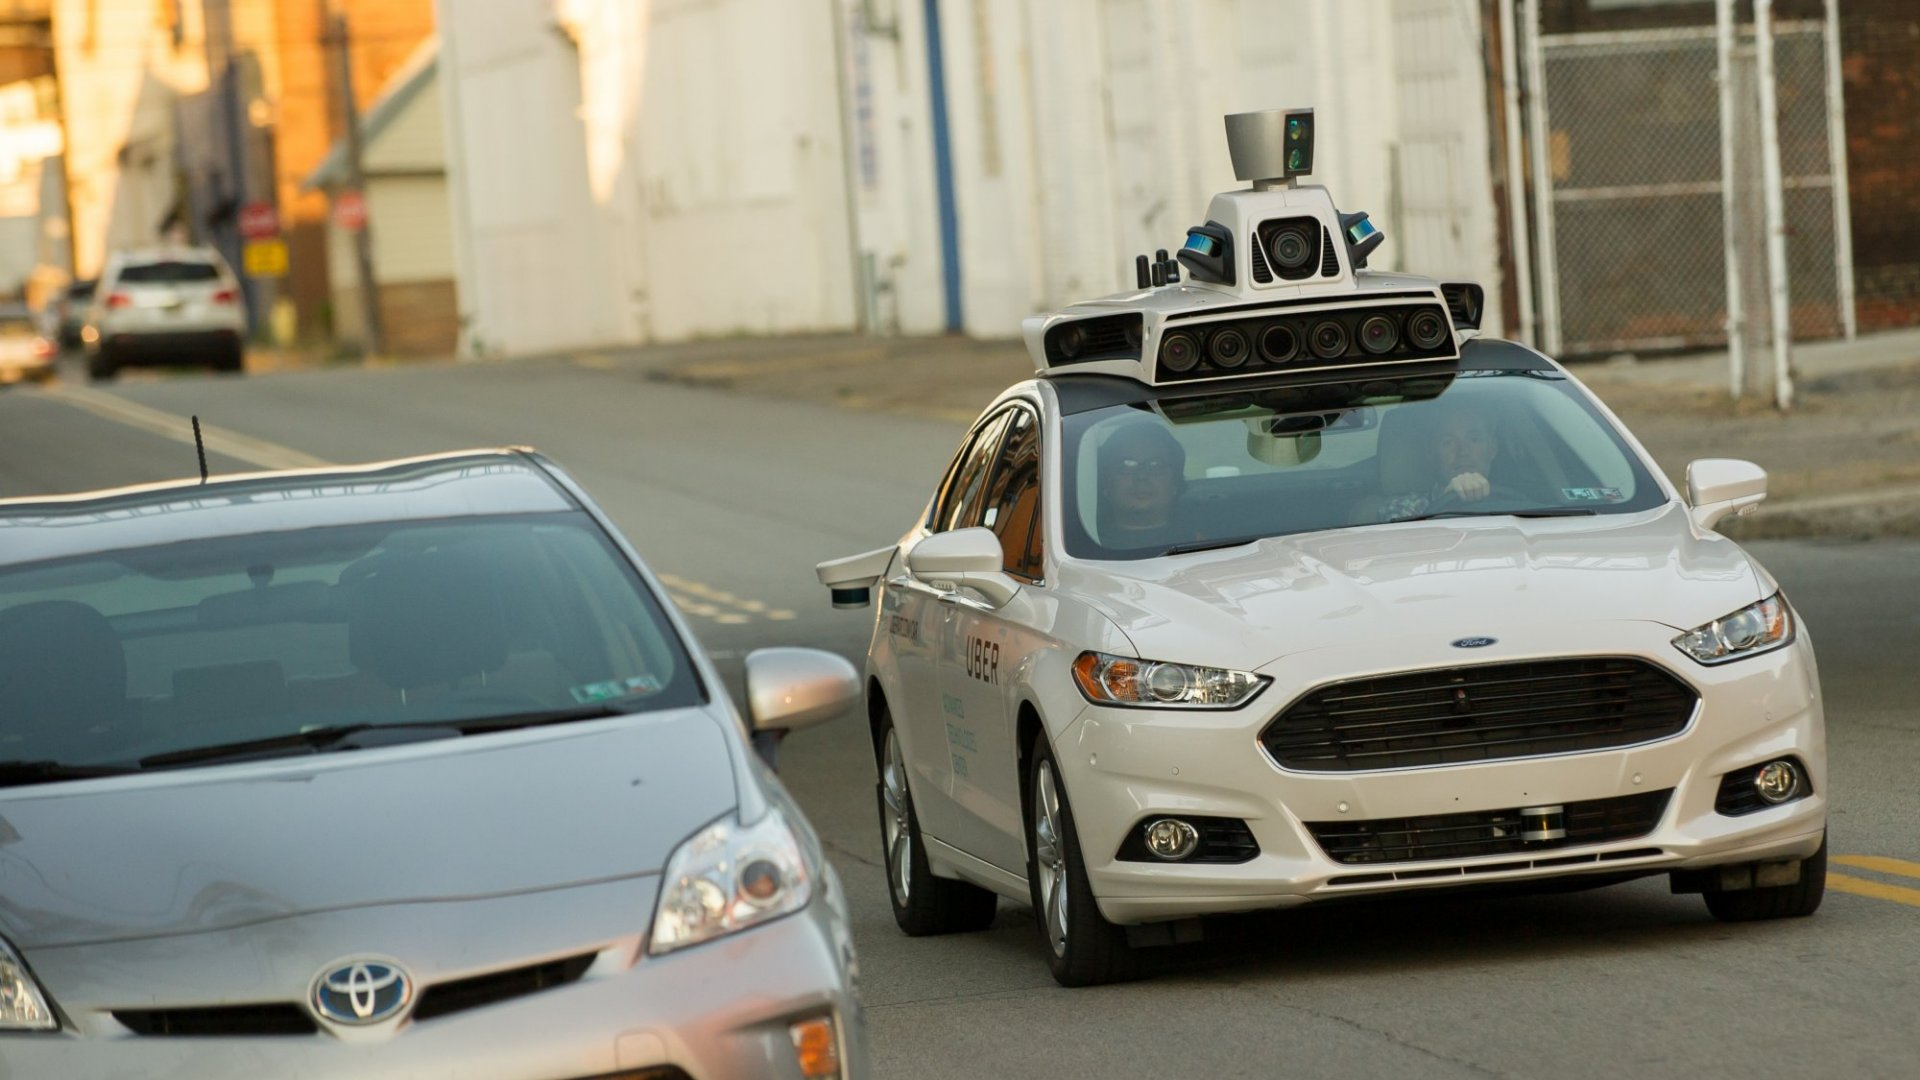 An autonomous Uber car in Pittsburgh.